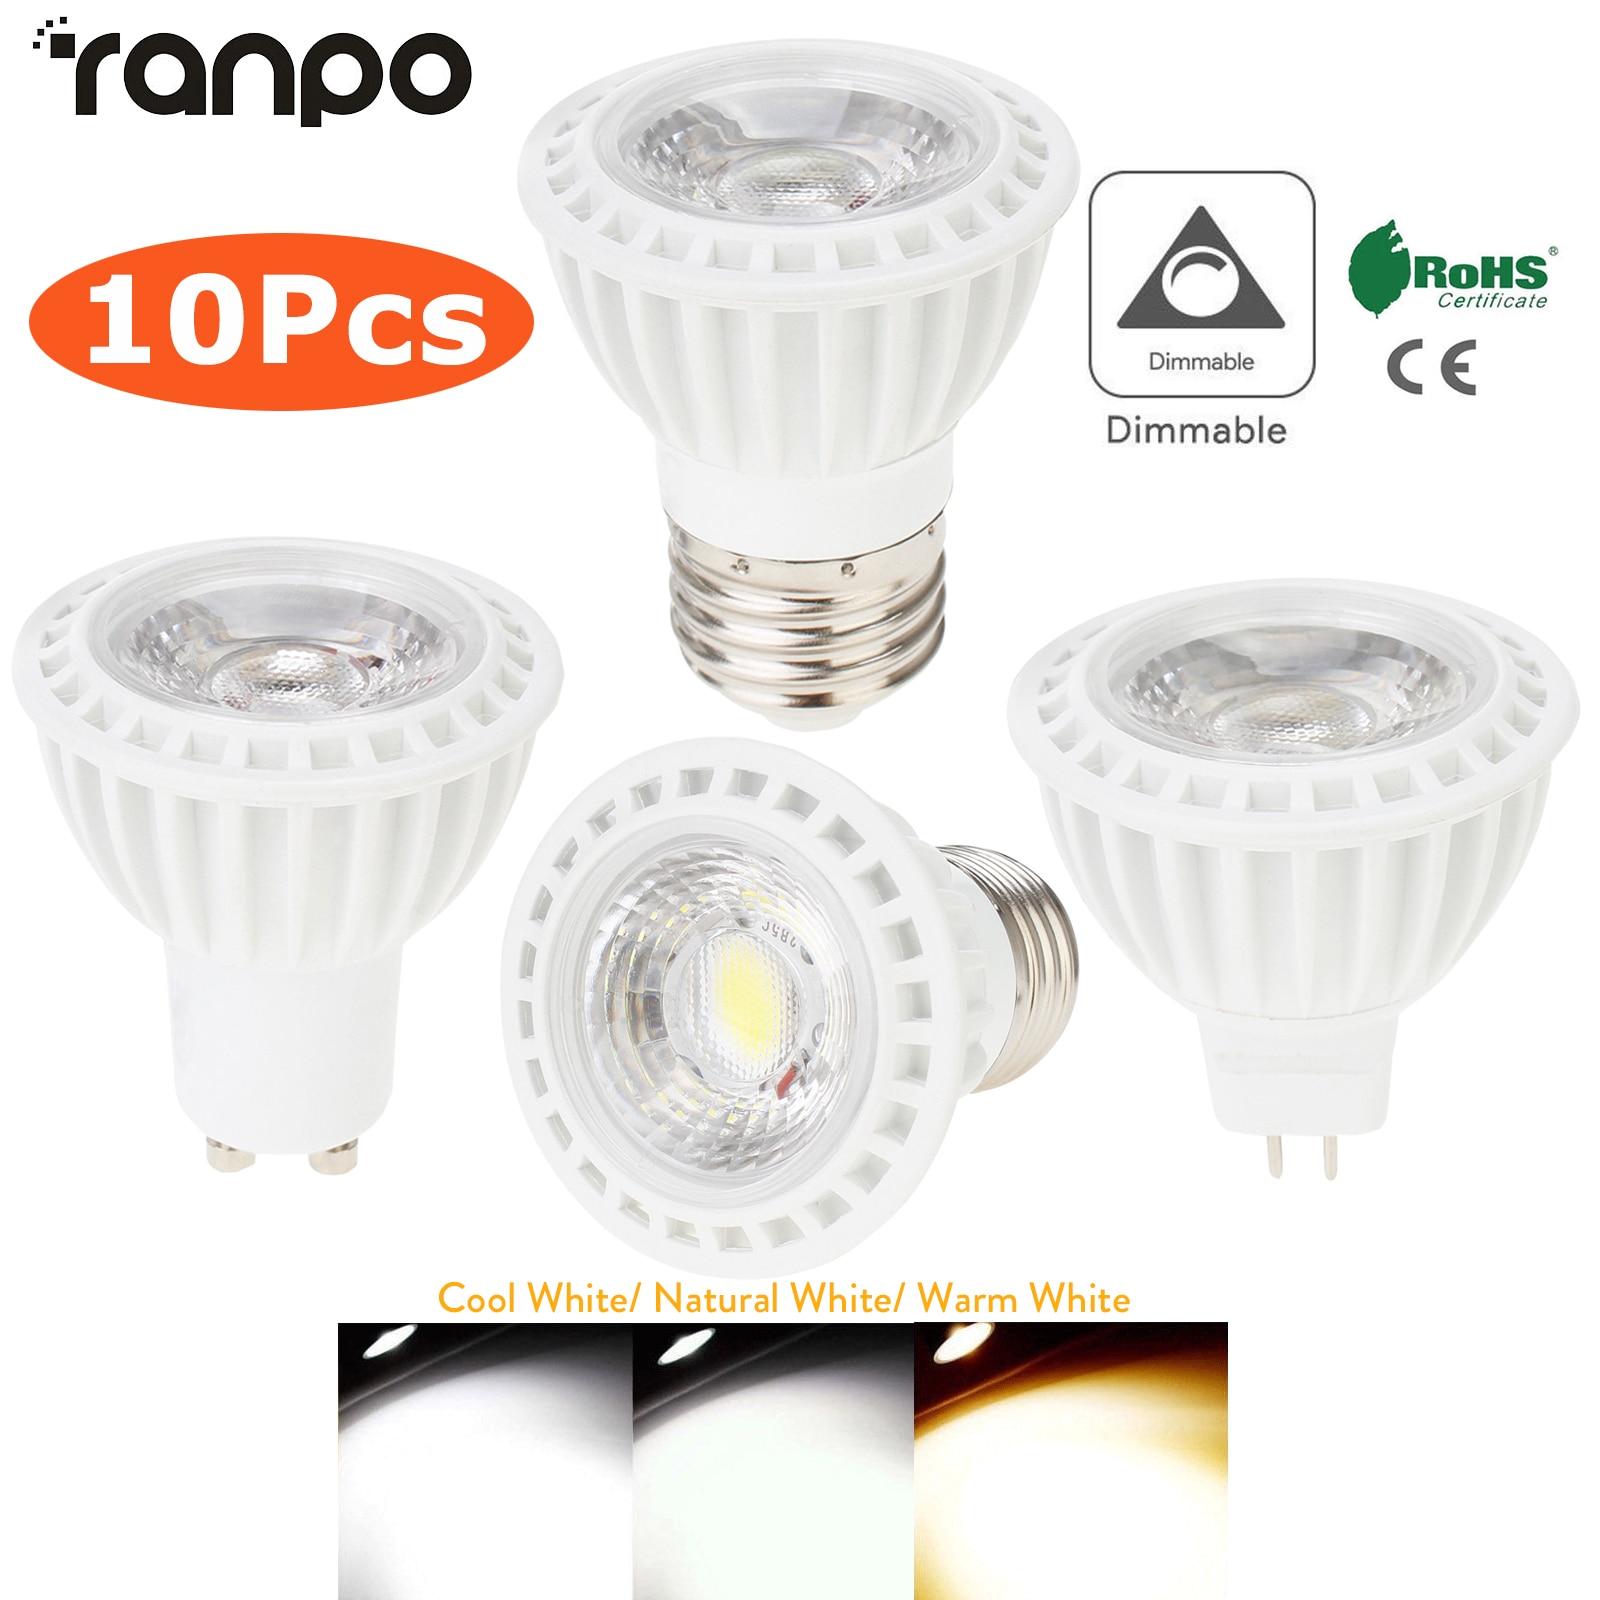 10pcs Dimmable LED Spotlights E26 E27 GU10 MR16 15W COB Light Bulbs 45° Beam Angle 110V 220V DC 12V For Home Office Table Lamp